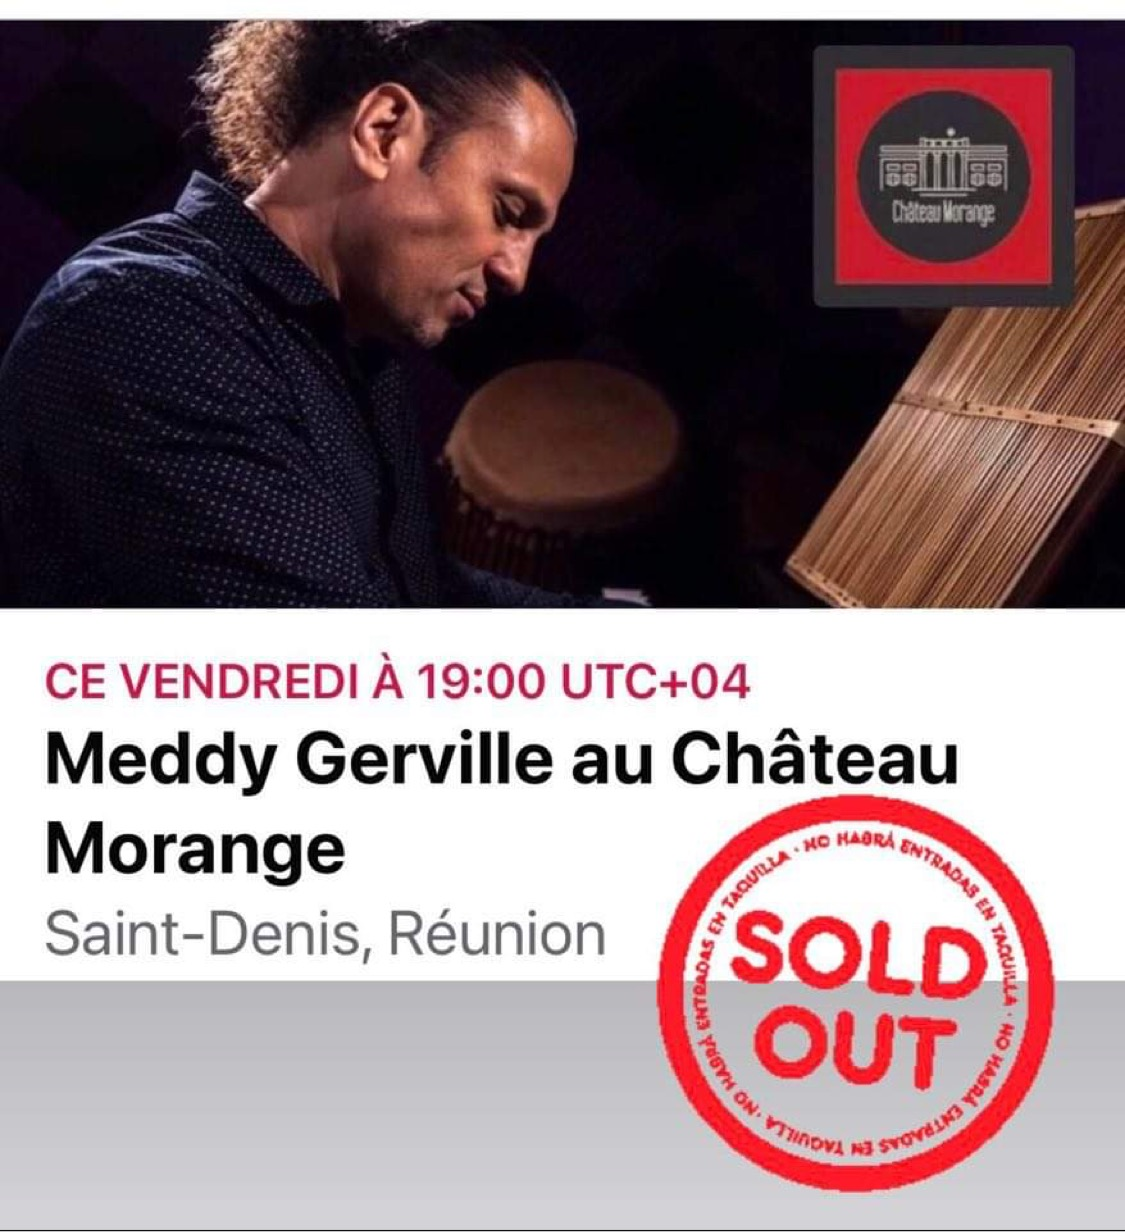 Meddy Gerville at Château Morange – Reunion Island